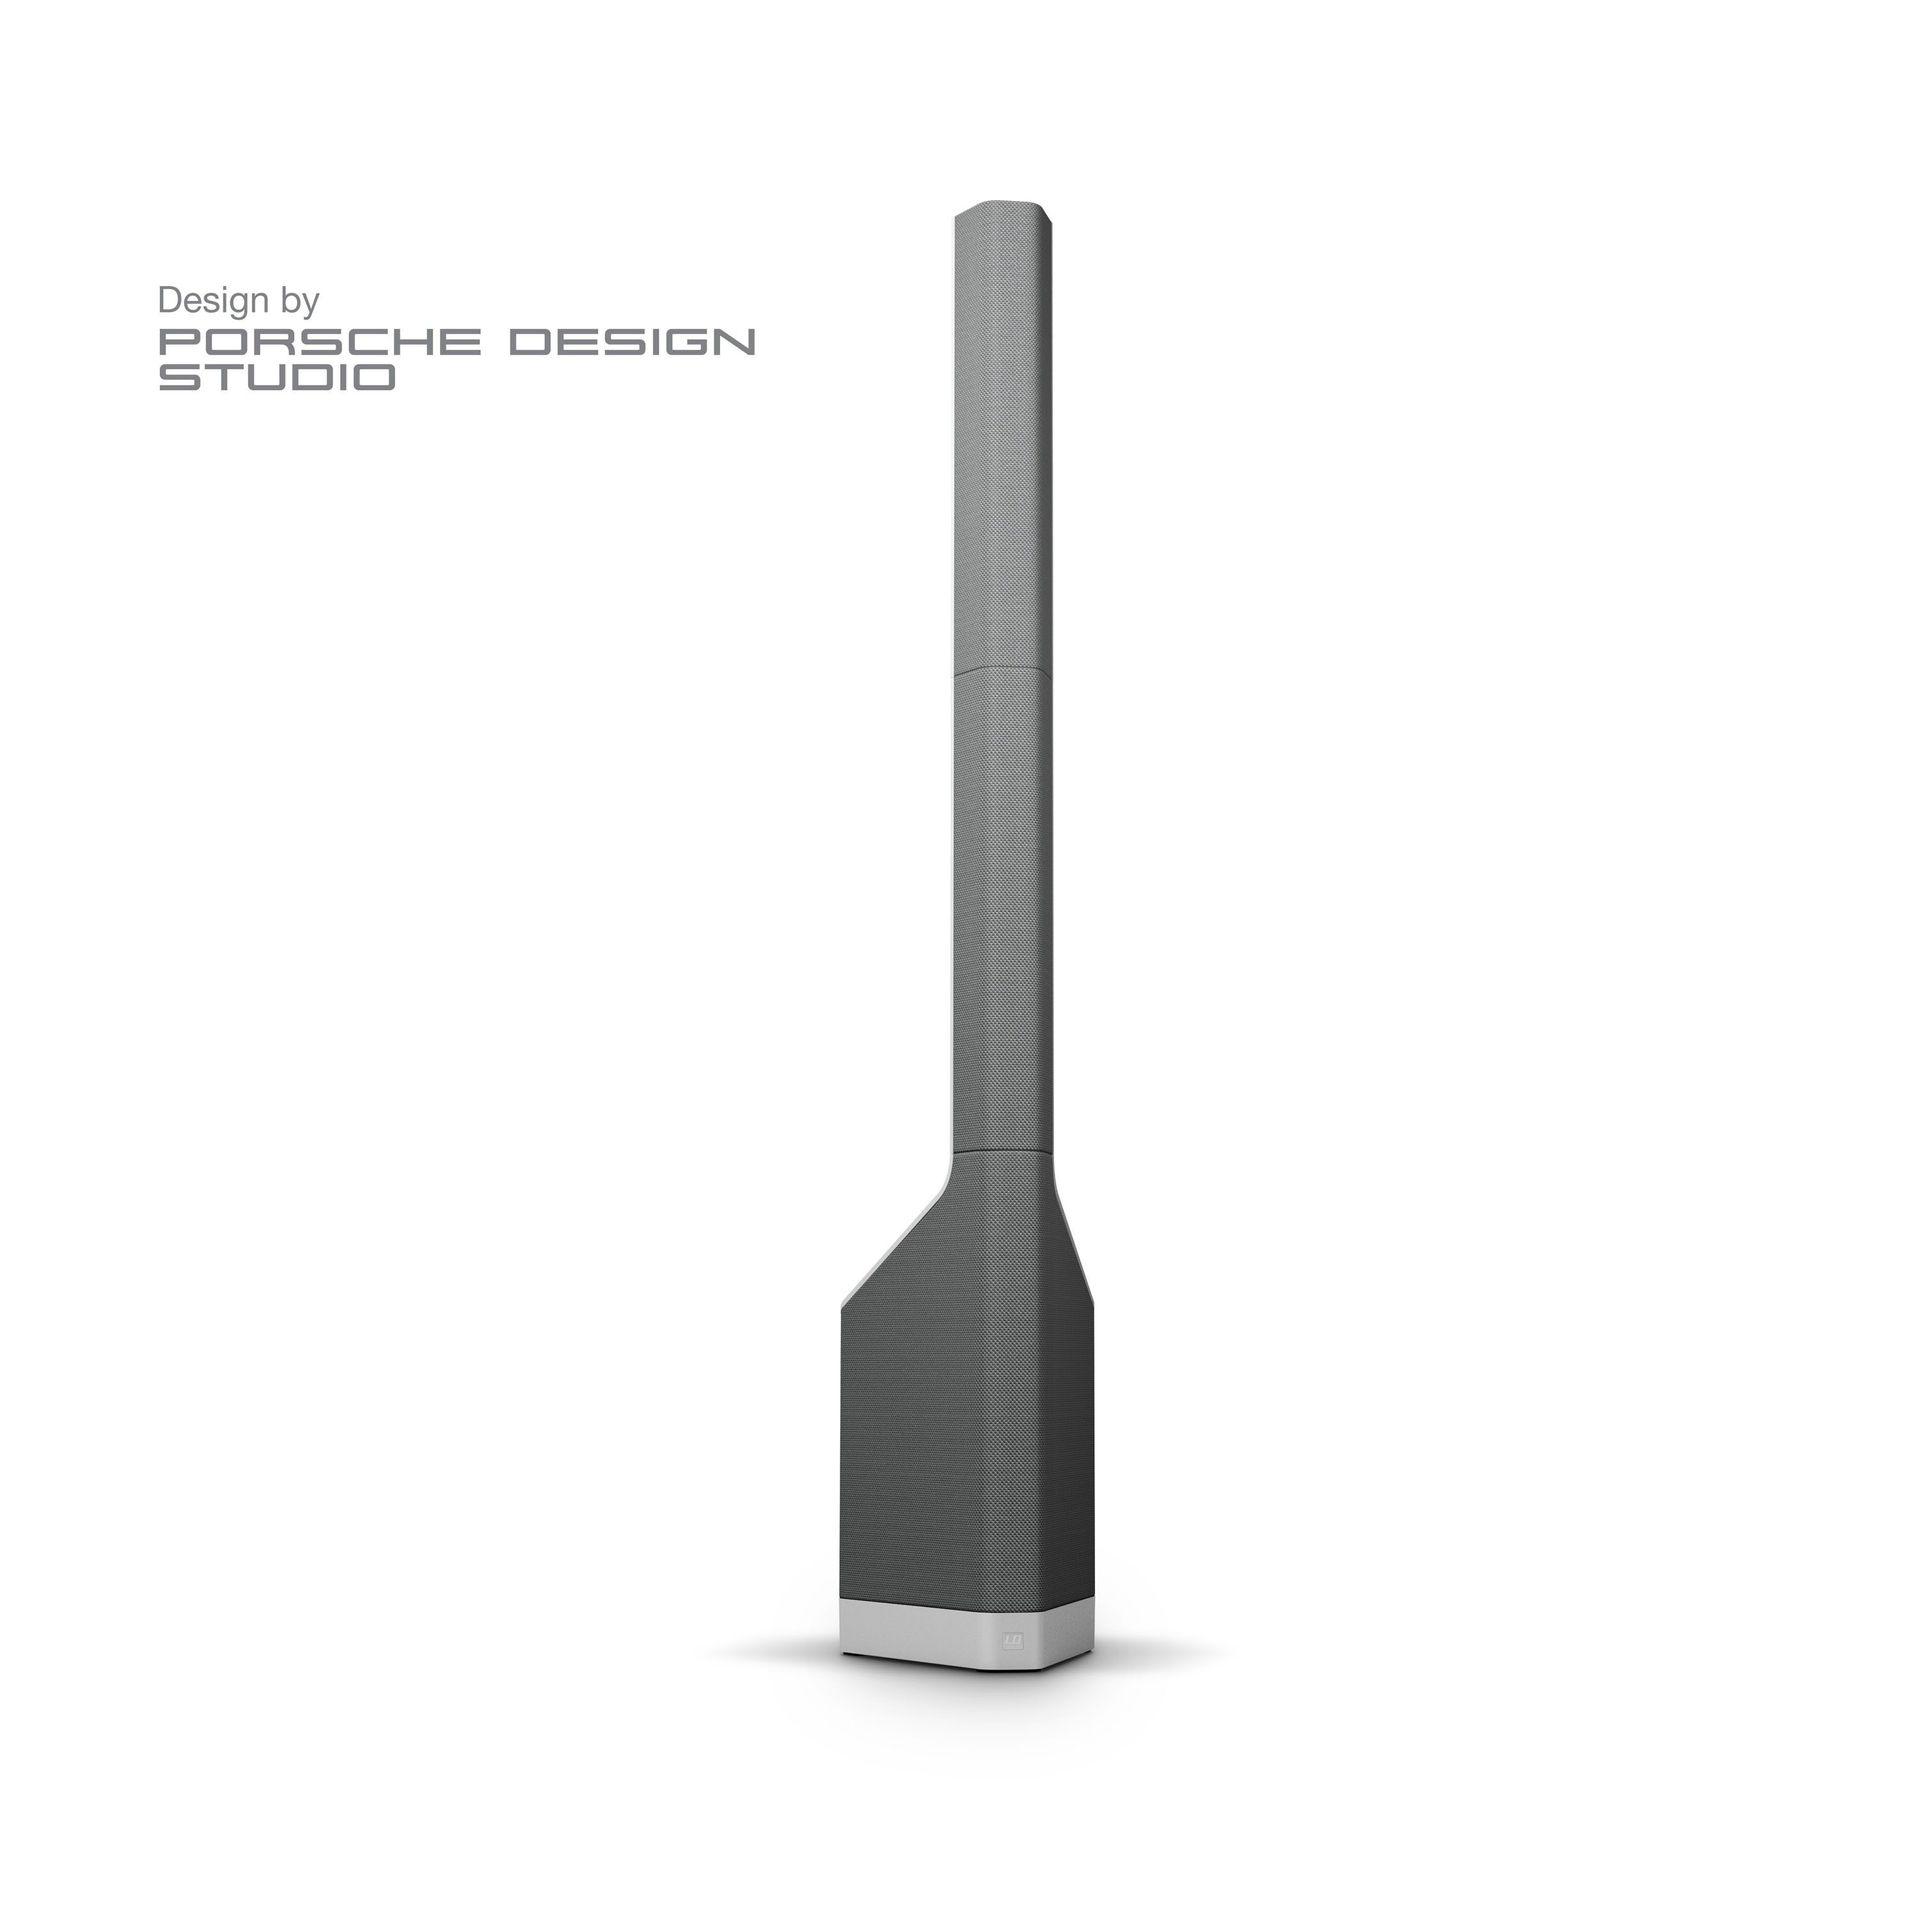 LD Systems Maui P900 G Aktives PA-Säulensystem, Farbe: Platinum Grey